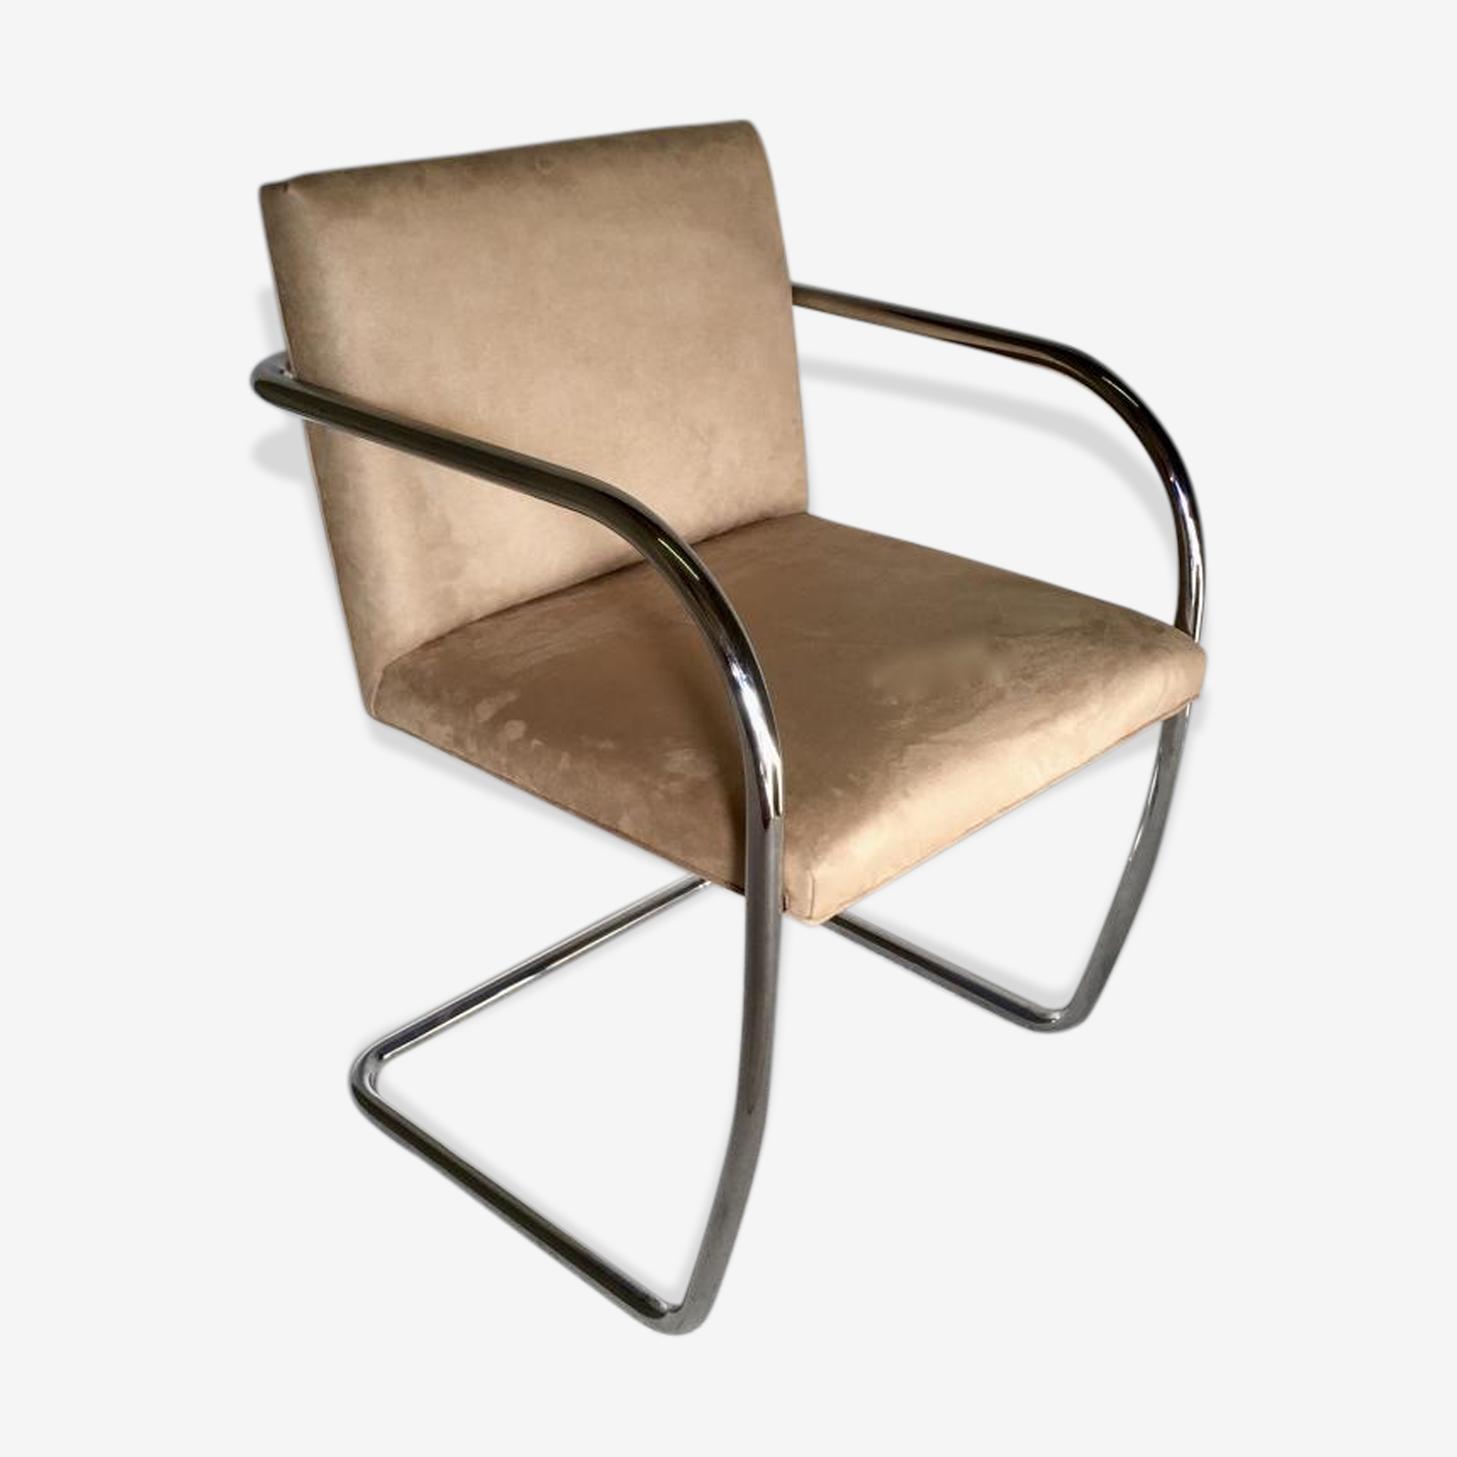 Chaise de bureau moderniste 1980s